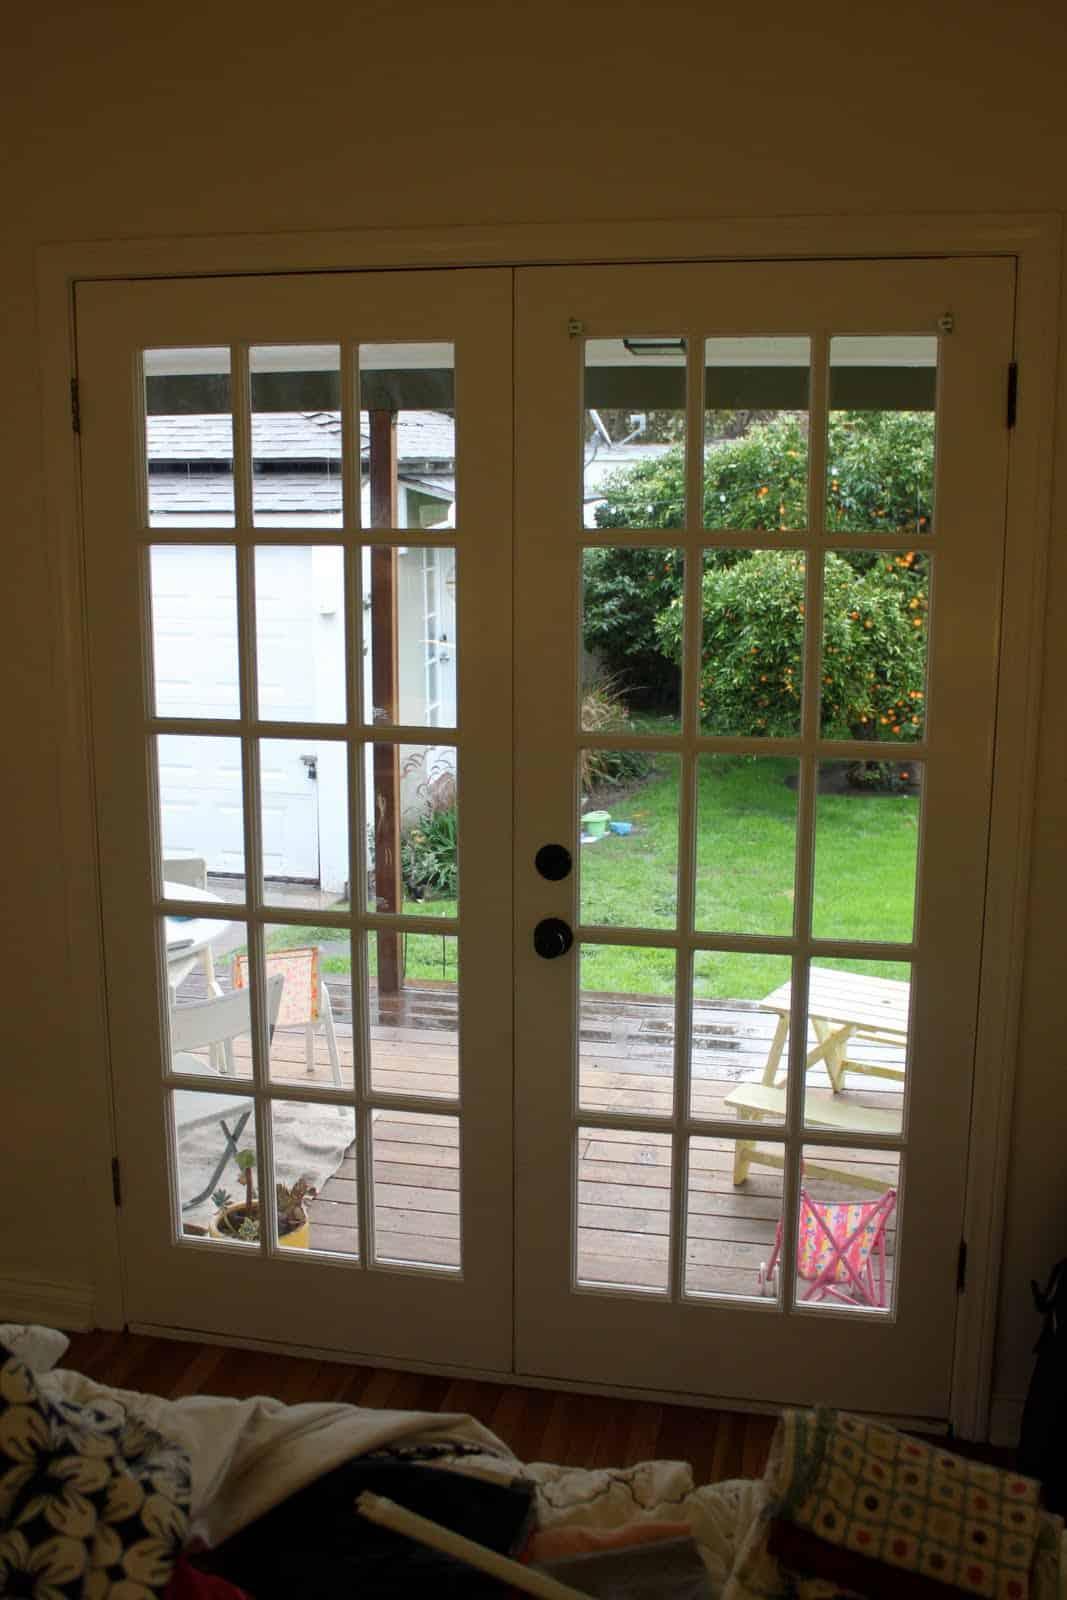 Patio door curtains diy - Diy French Door Curtain Panel Tutorial